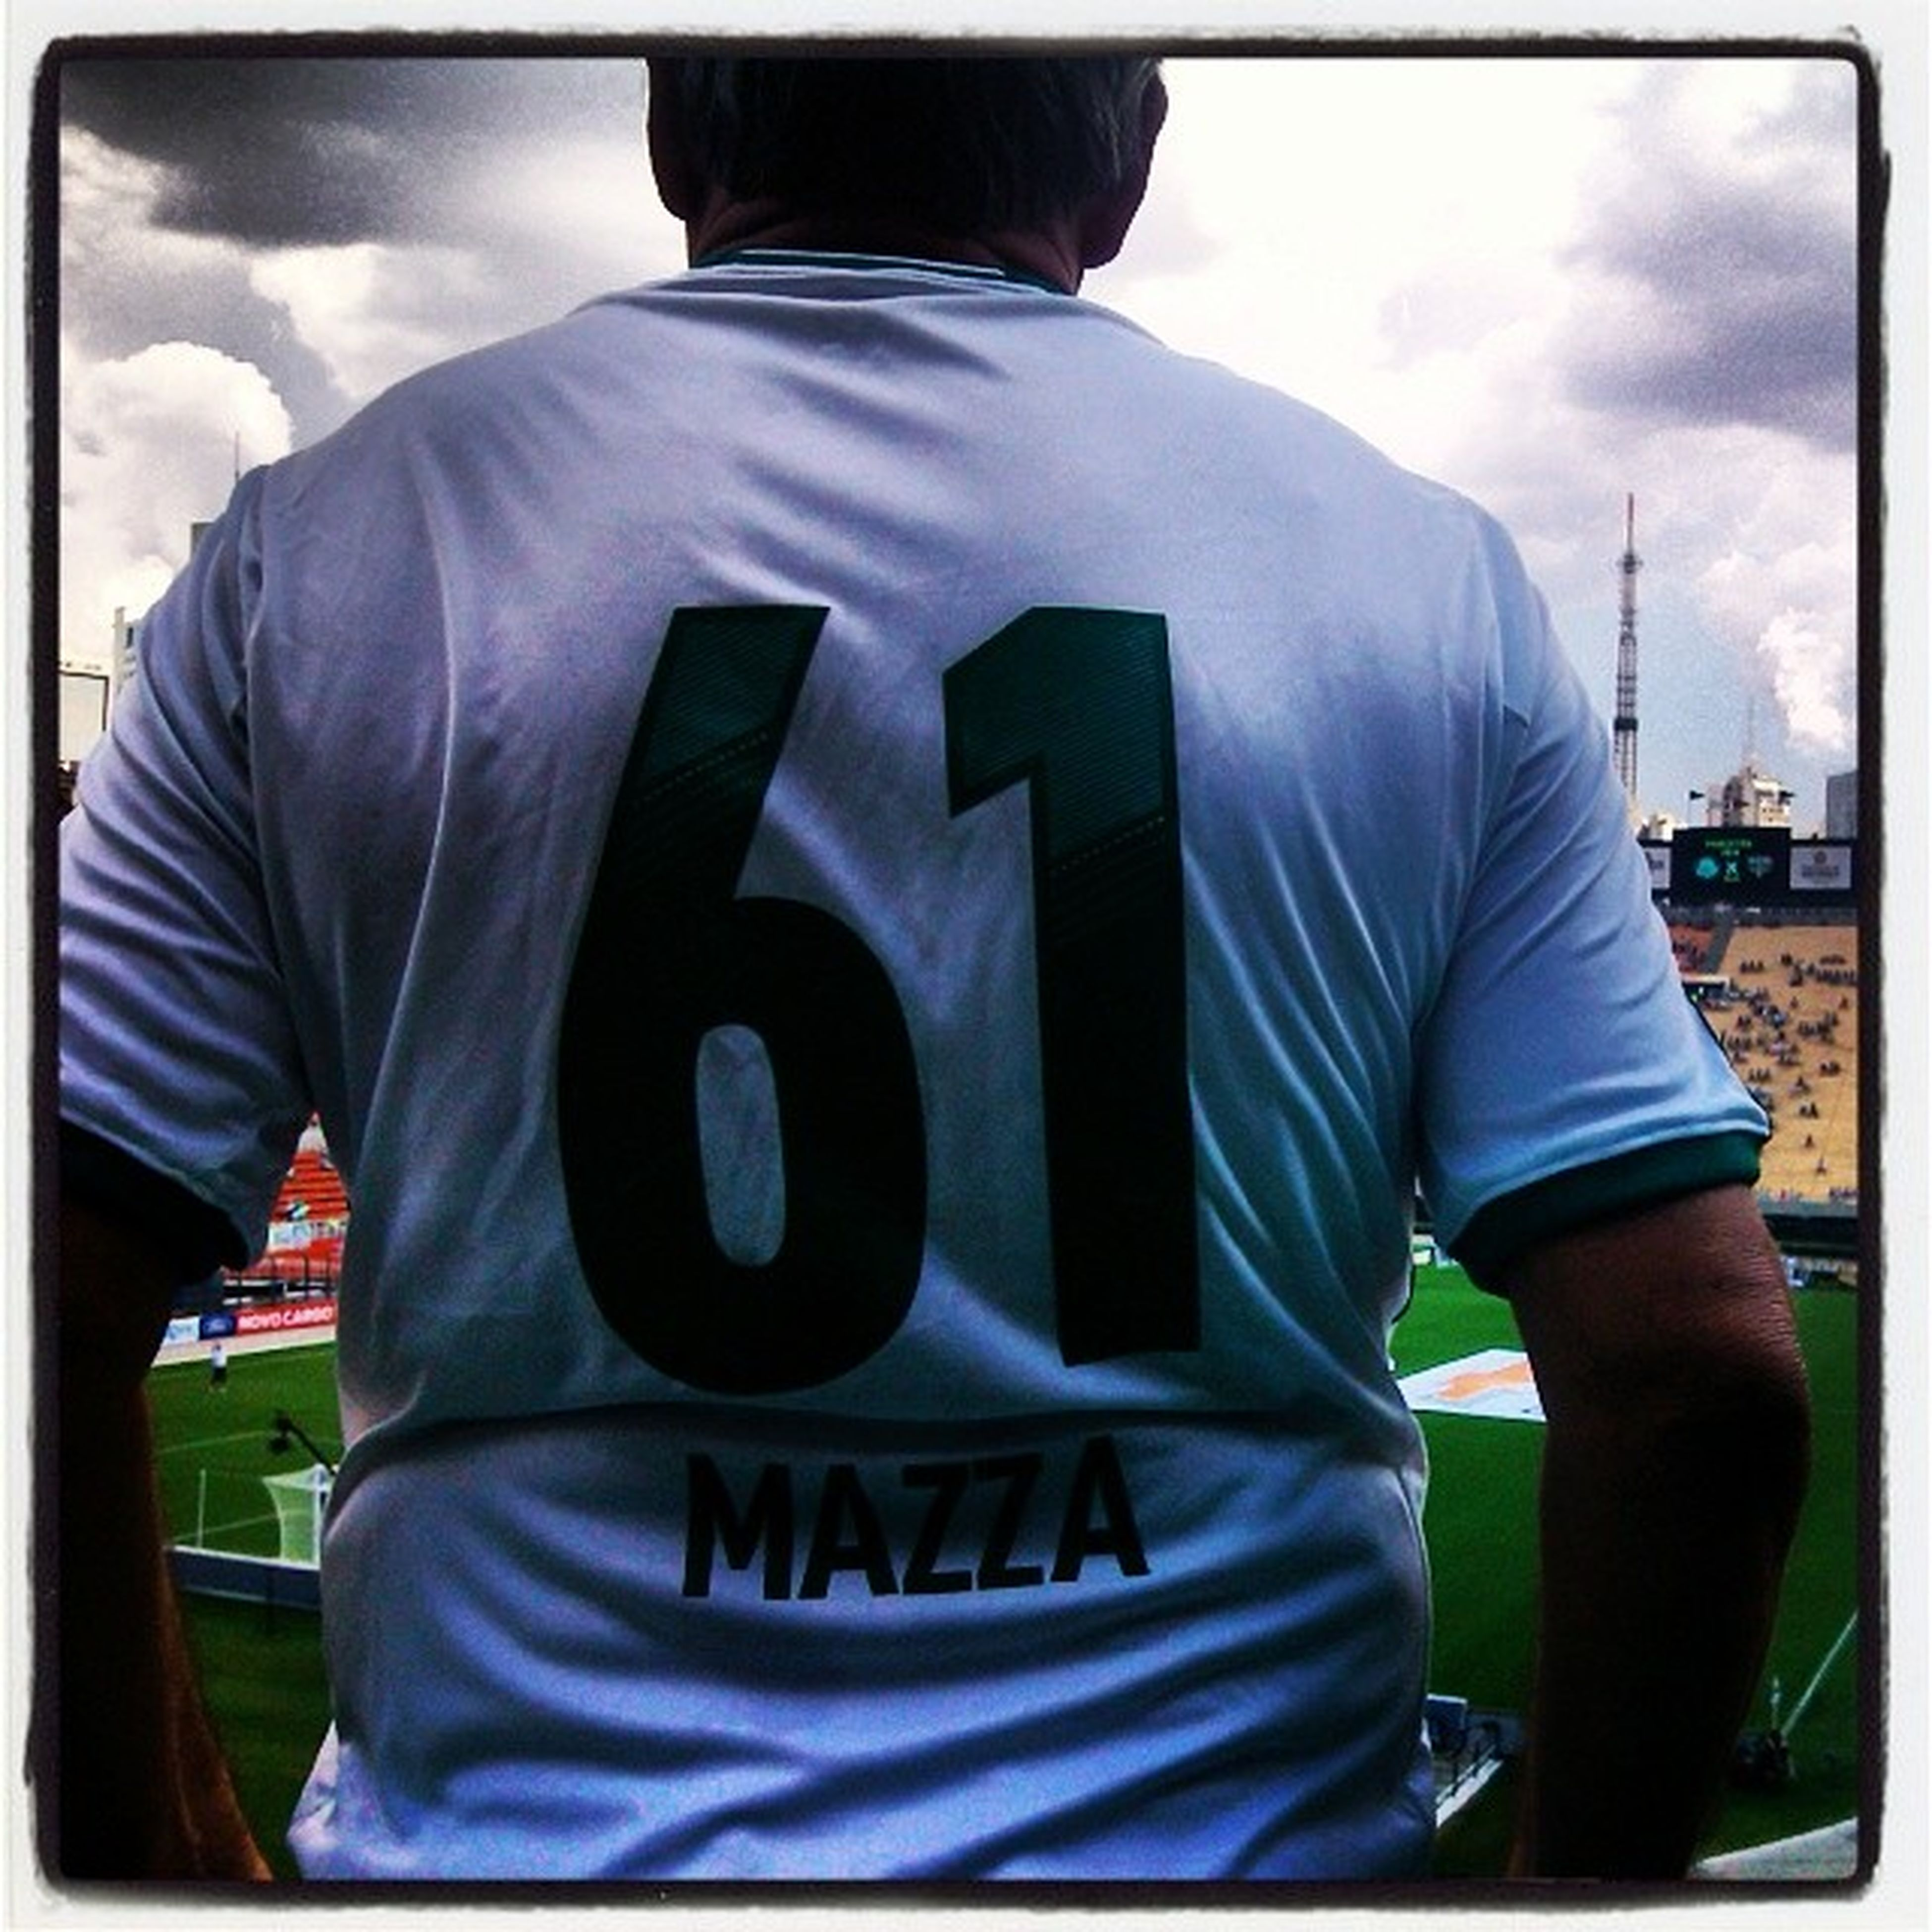 Mazza61 Verdazzo Galerazzo PalmeirasxAudax Palmeirasminhavidaévoce Palmeiras